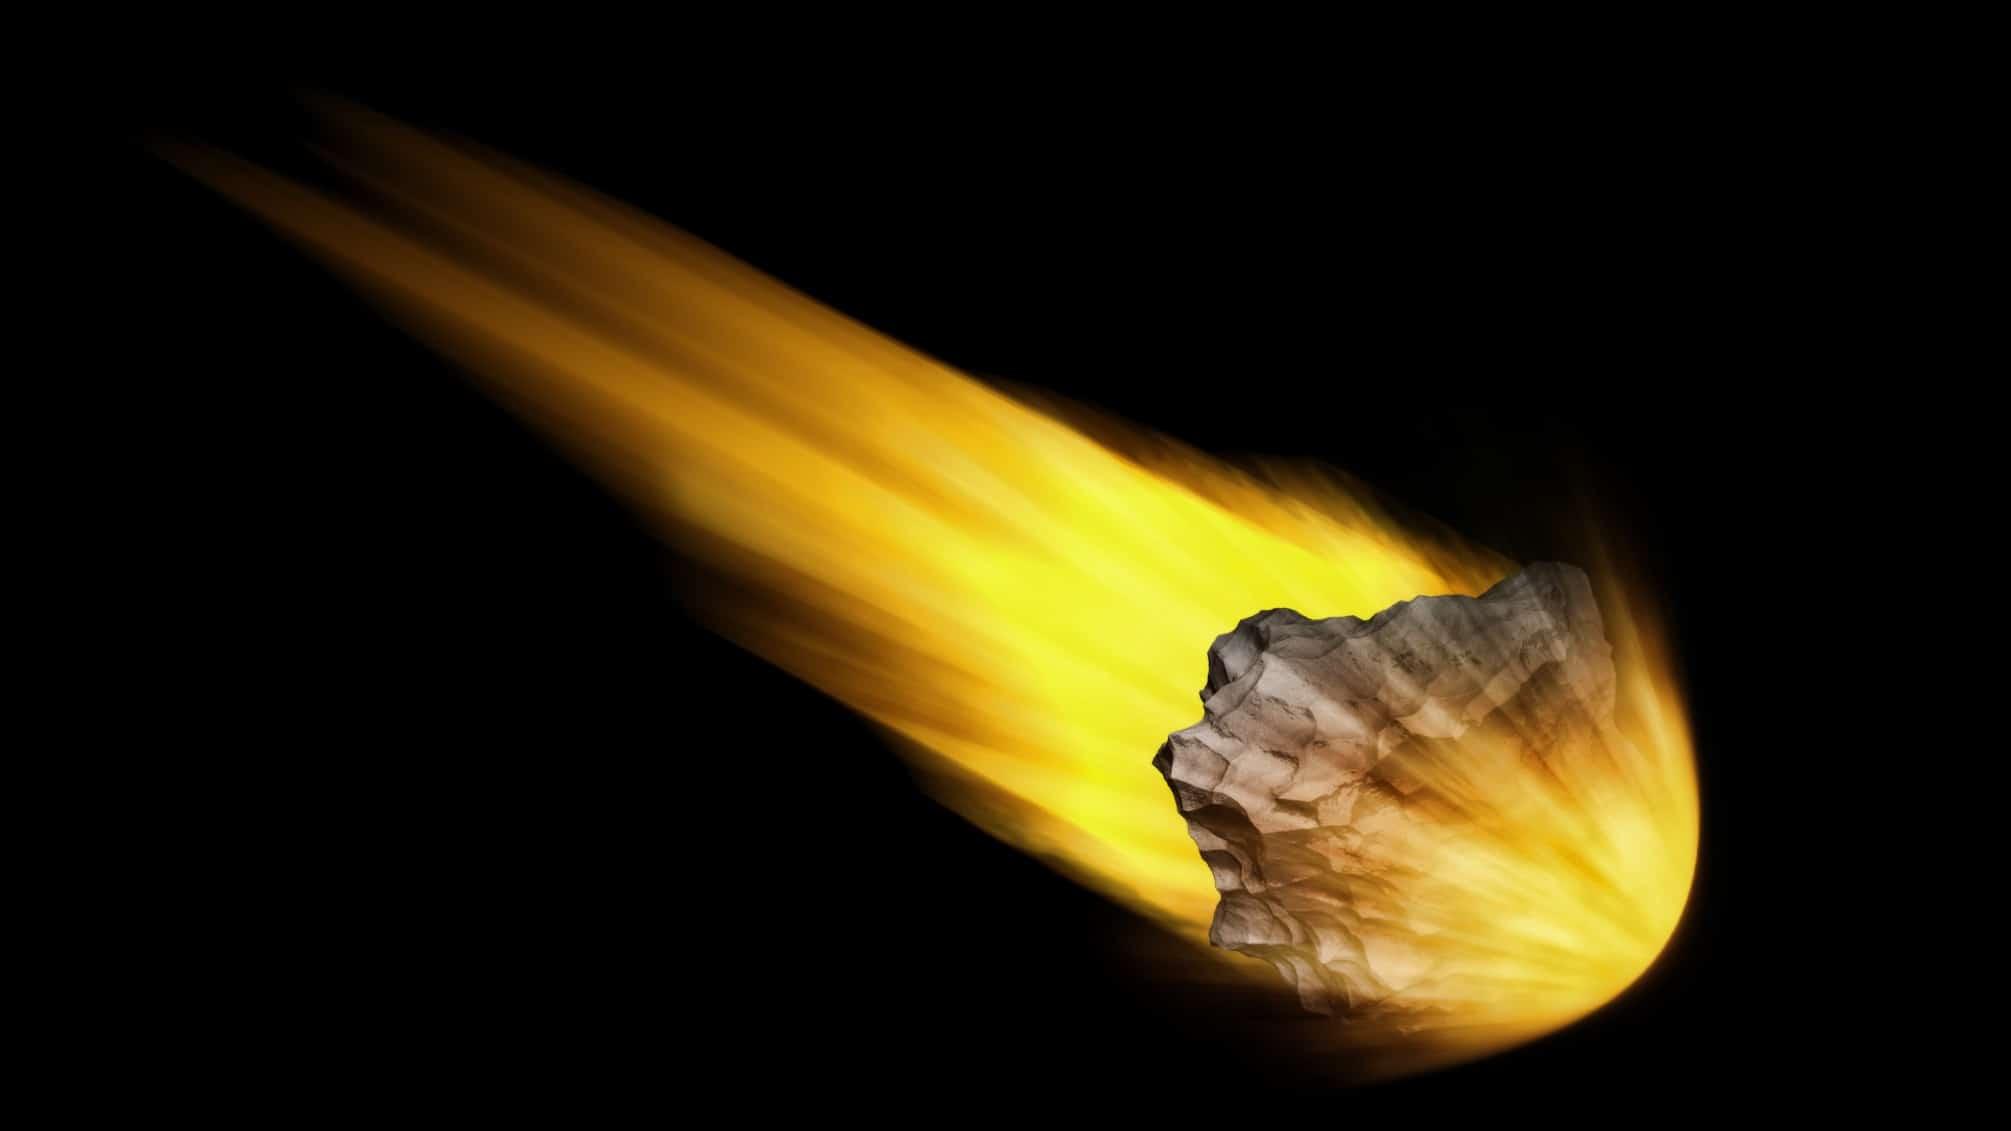 meteor speeding through space